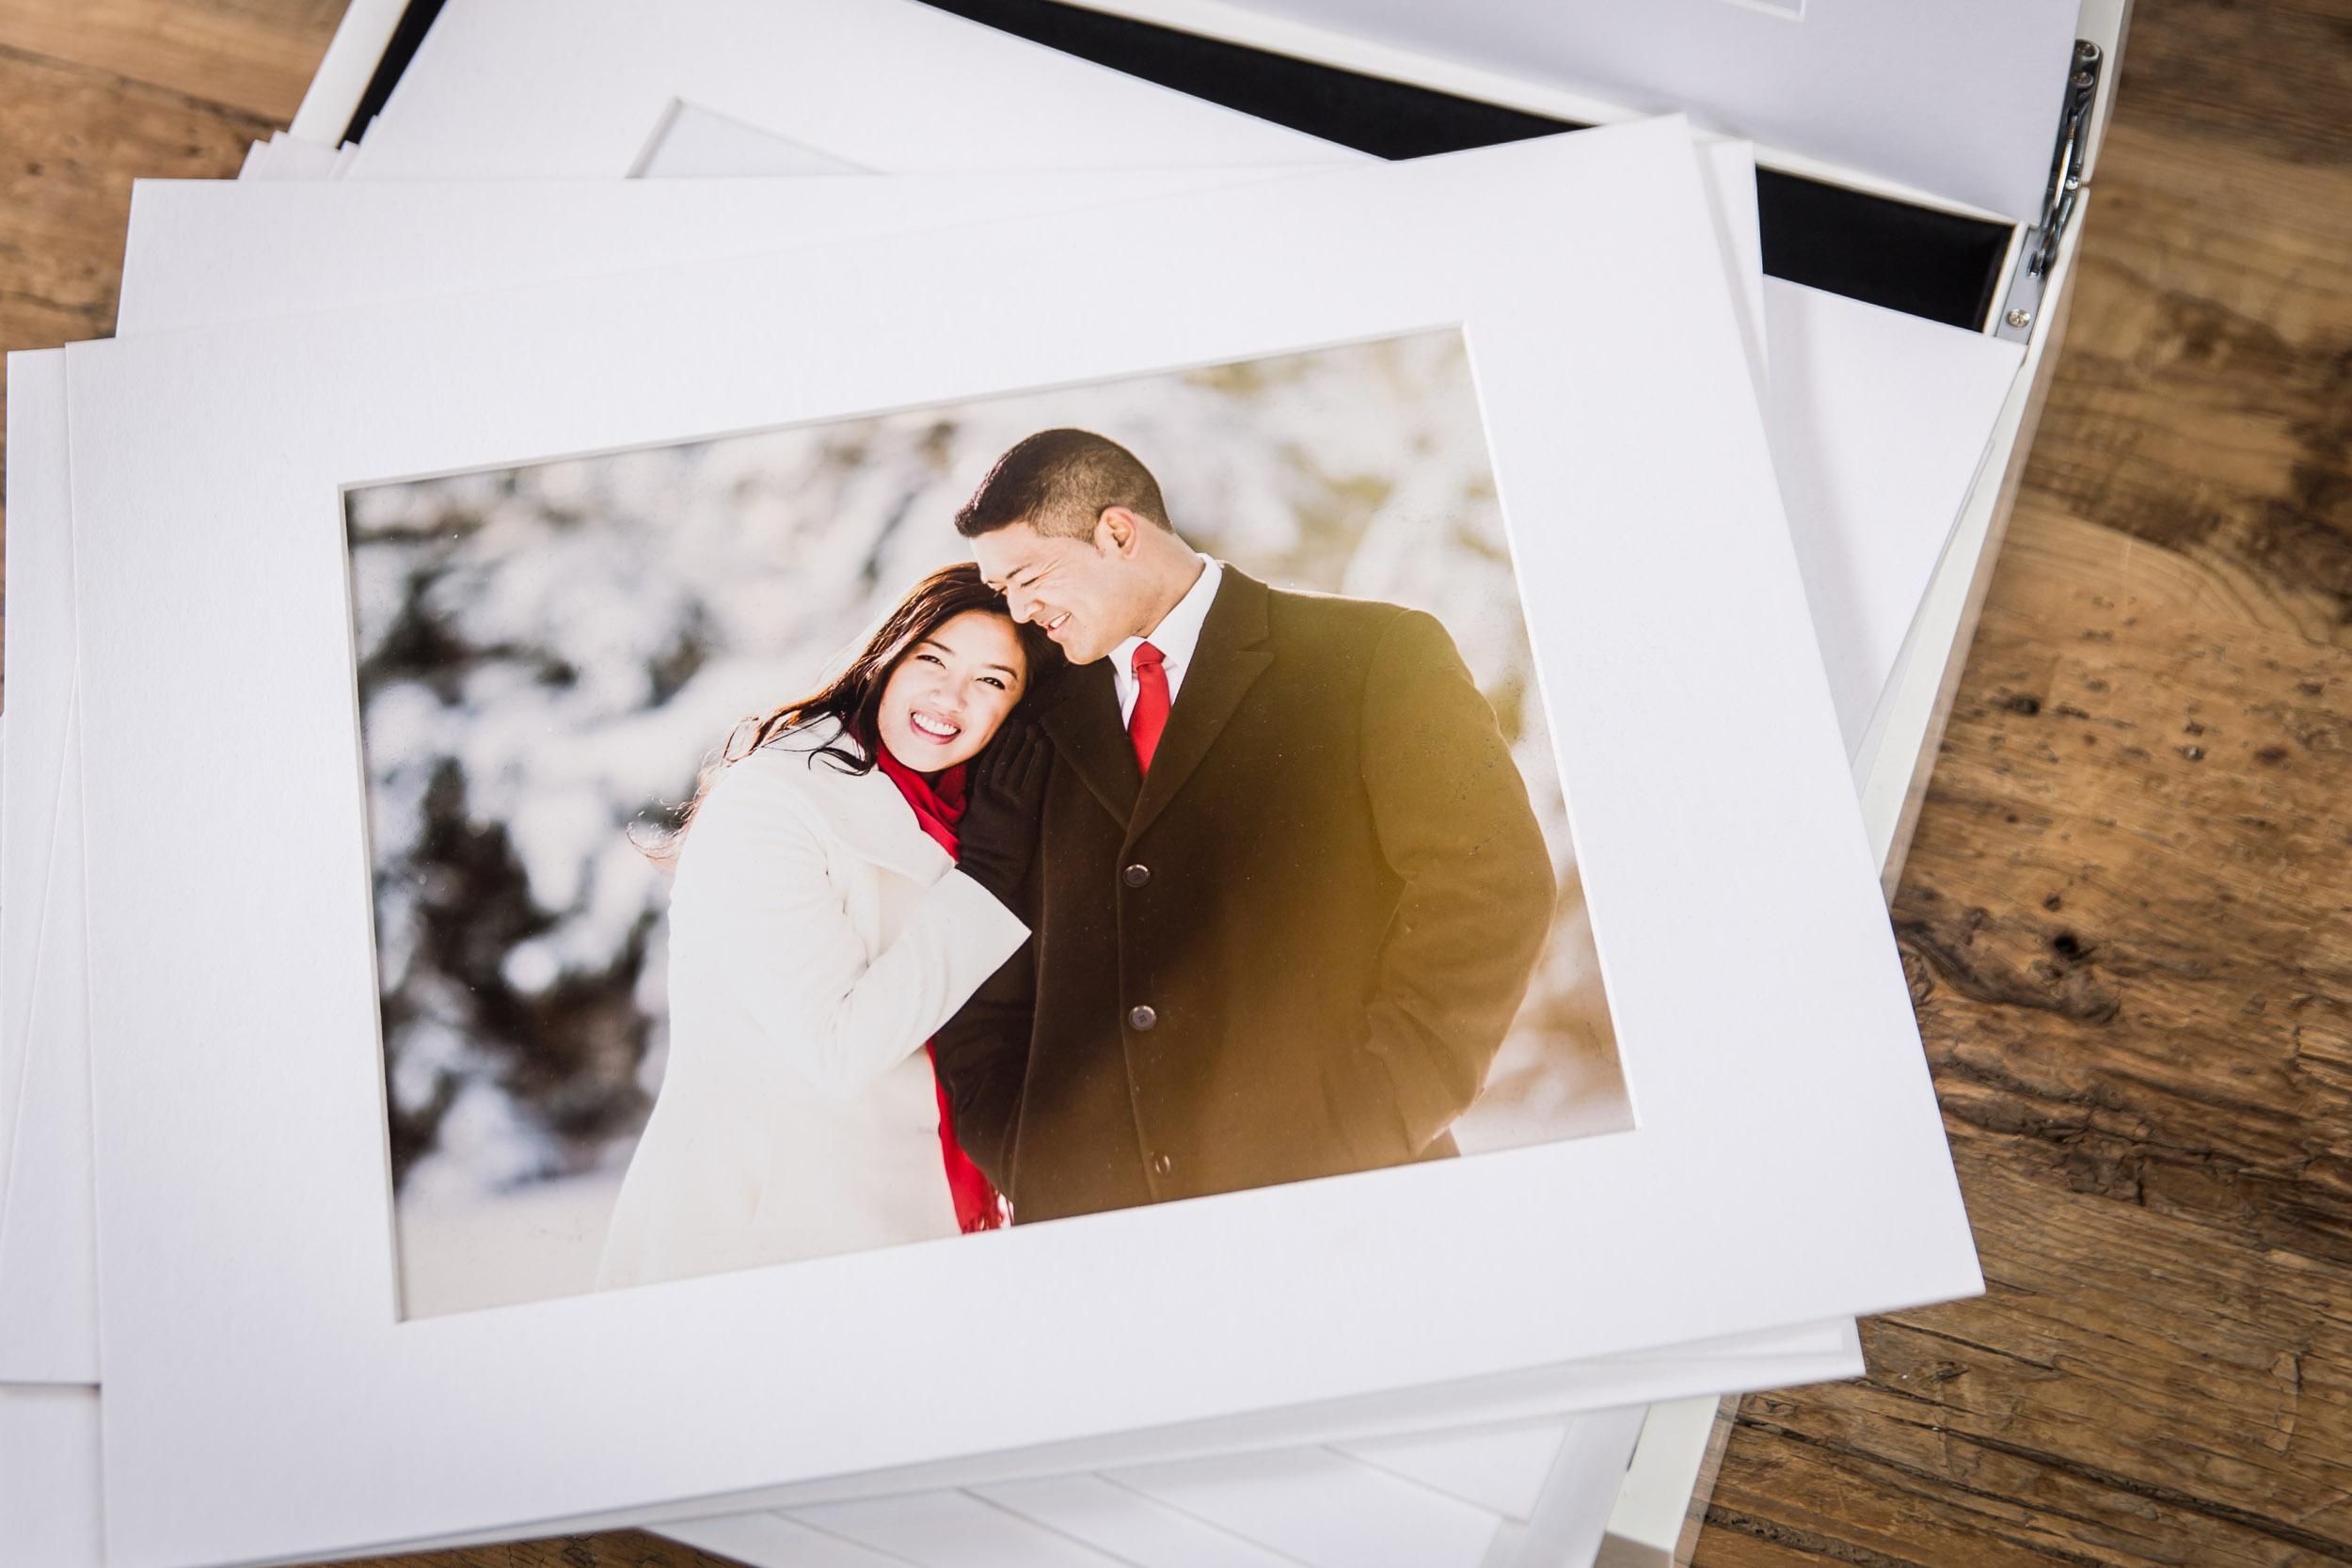 matted ottawa engagement photos